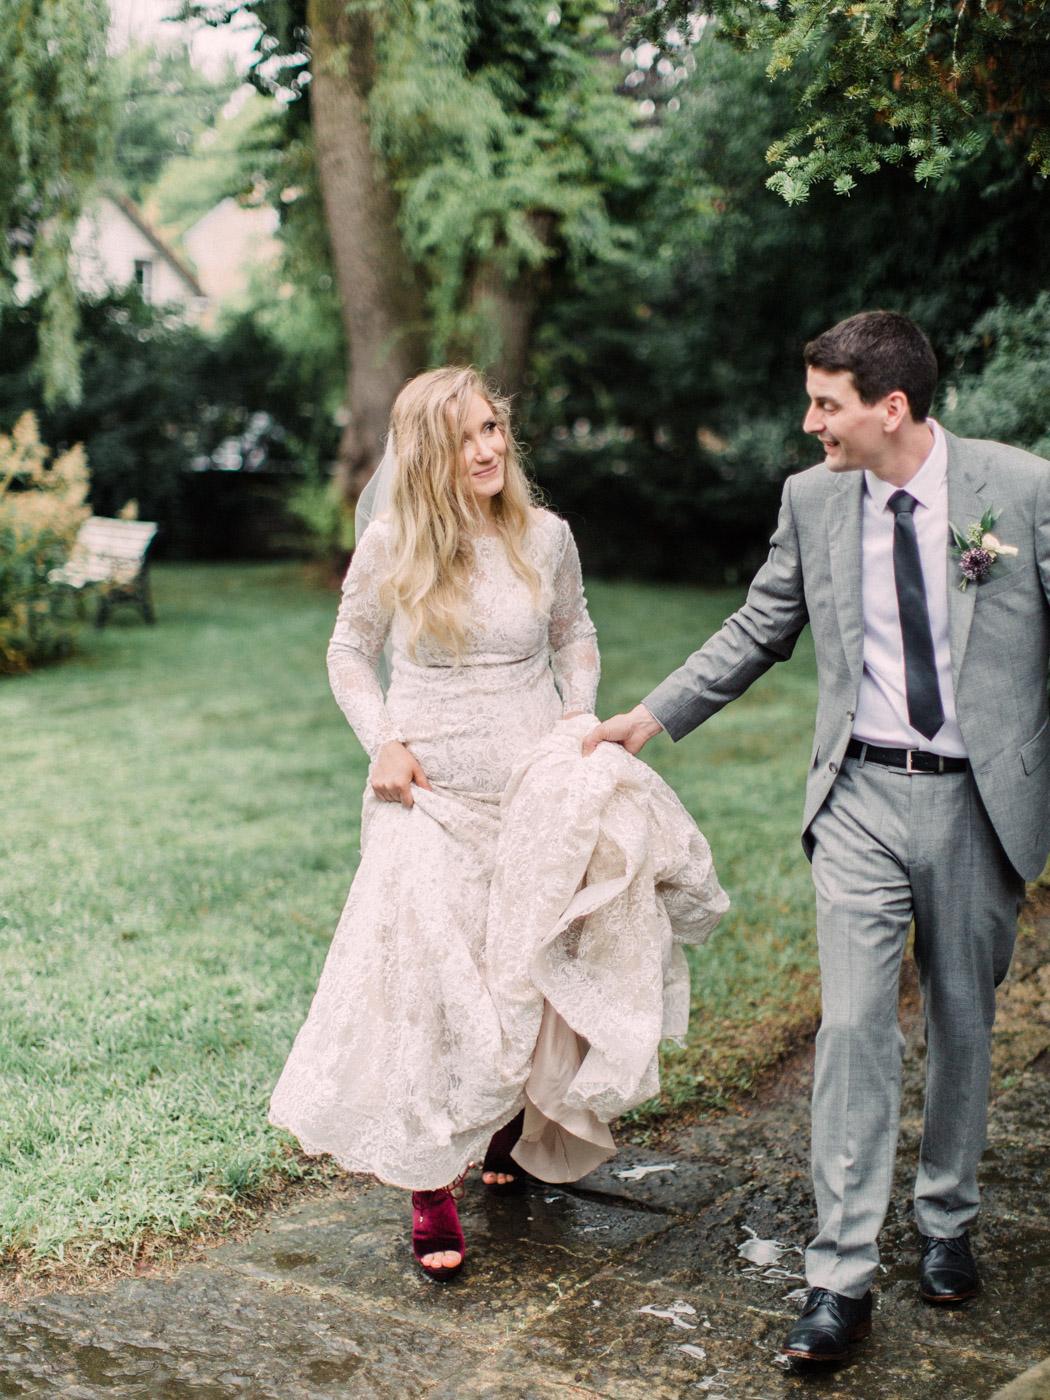 Toronto-wedding-photographer-intimate-classic-fine-art-elopement-ottawa68.jpg